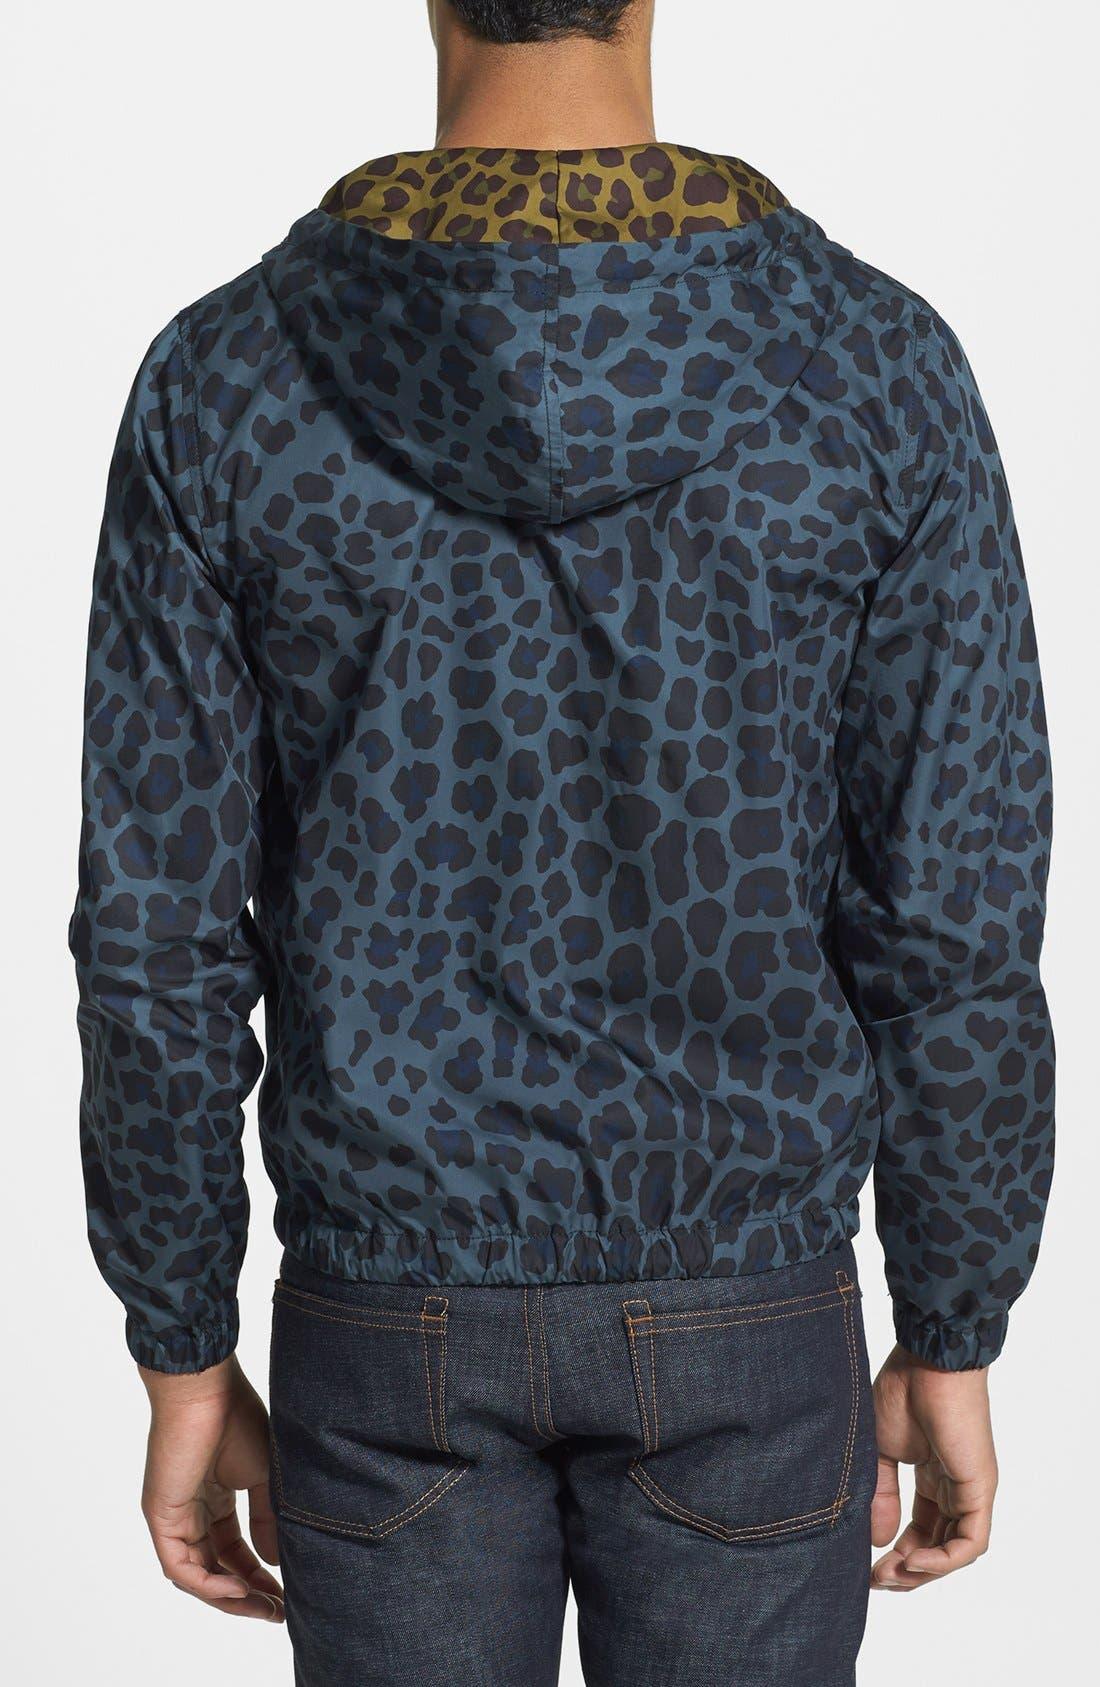 Alternate Image 2  - MARC BY MARC JACOBS 'London Leopard' Water Resistant Jacket